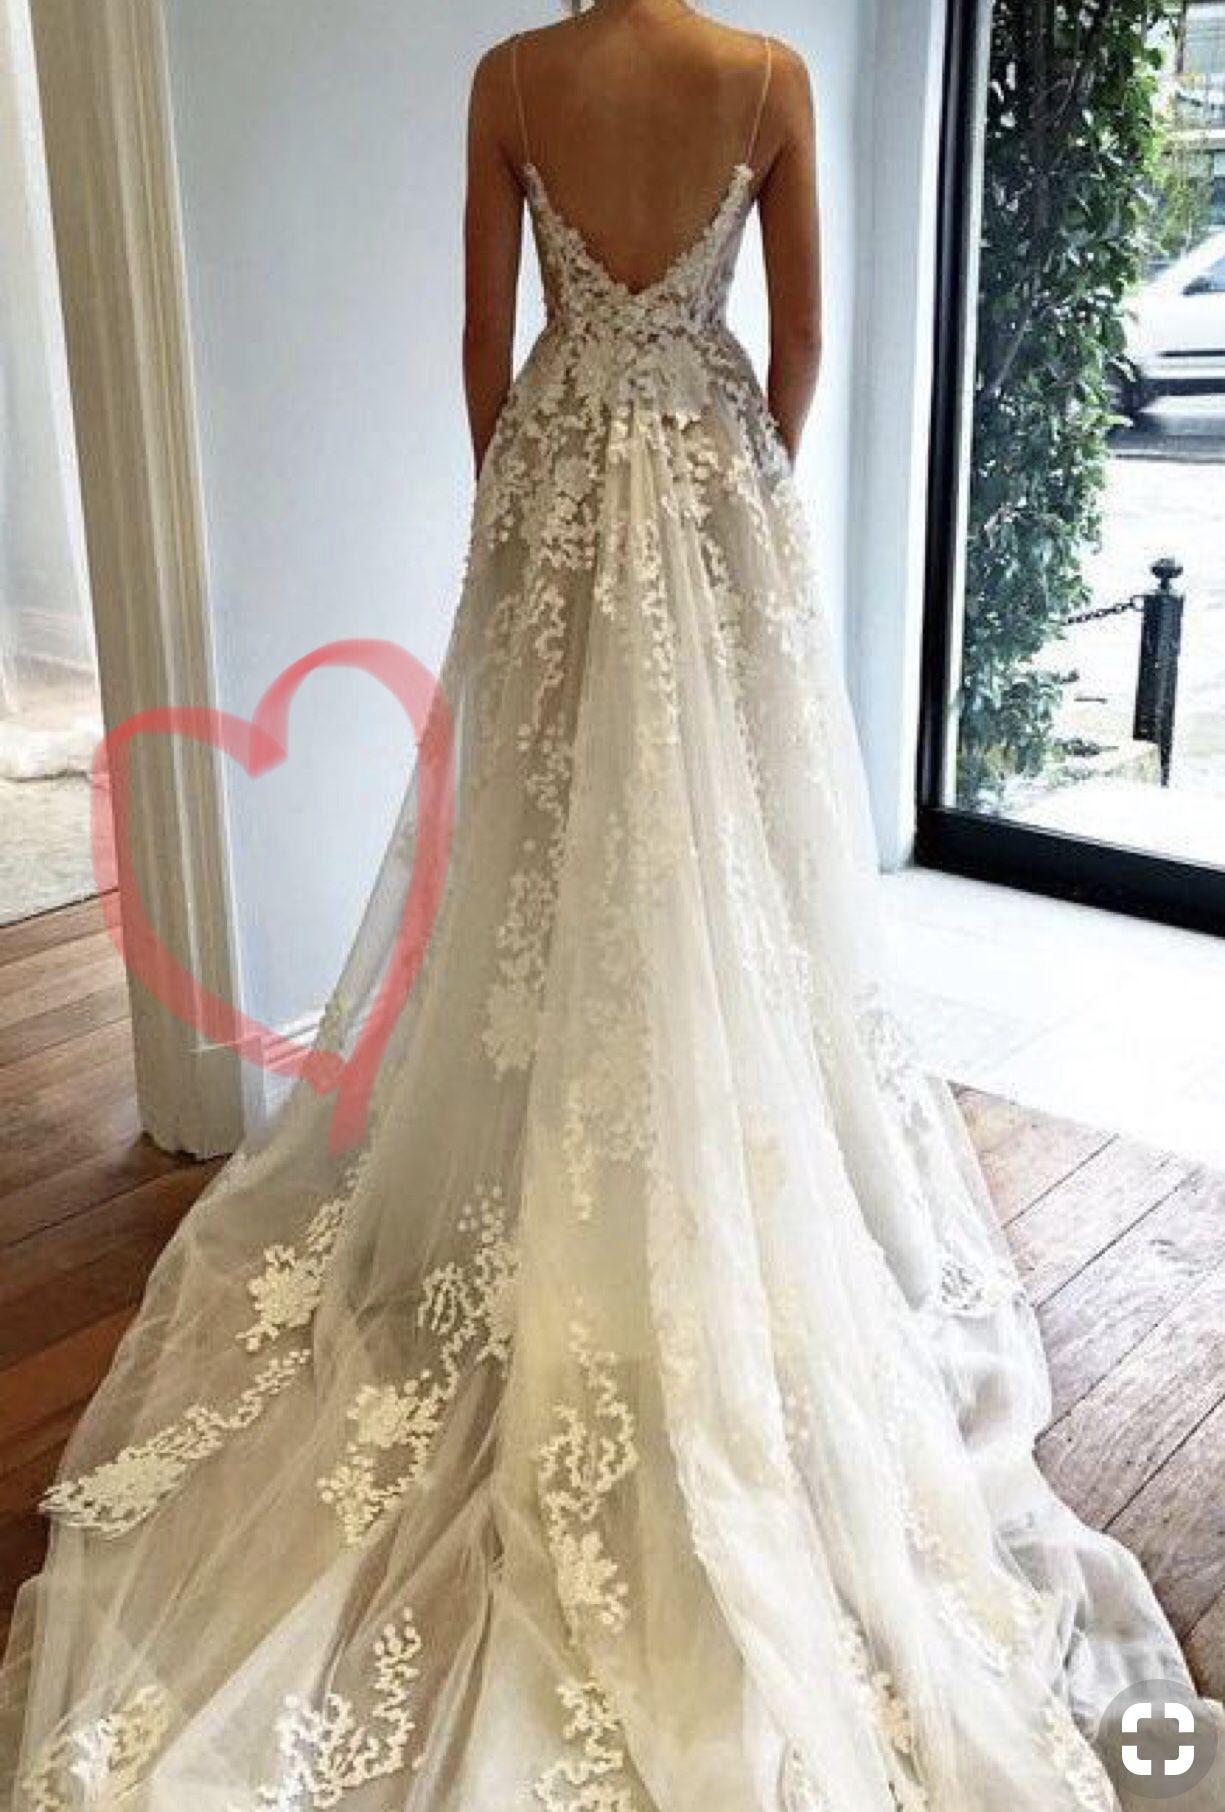 Lace spaghetti strap wedding dress  Deep V neck Wedding DressLace Wedding DressSpaghetti Straps Beach